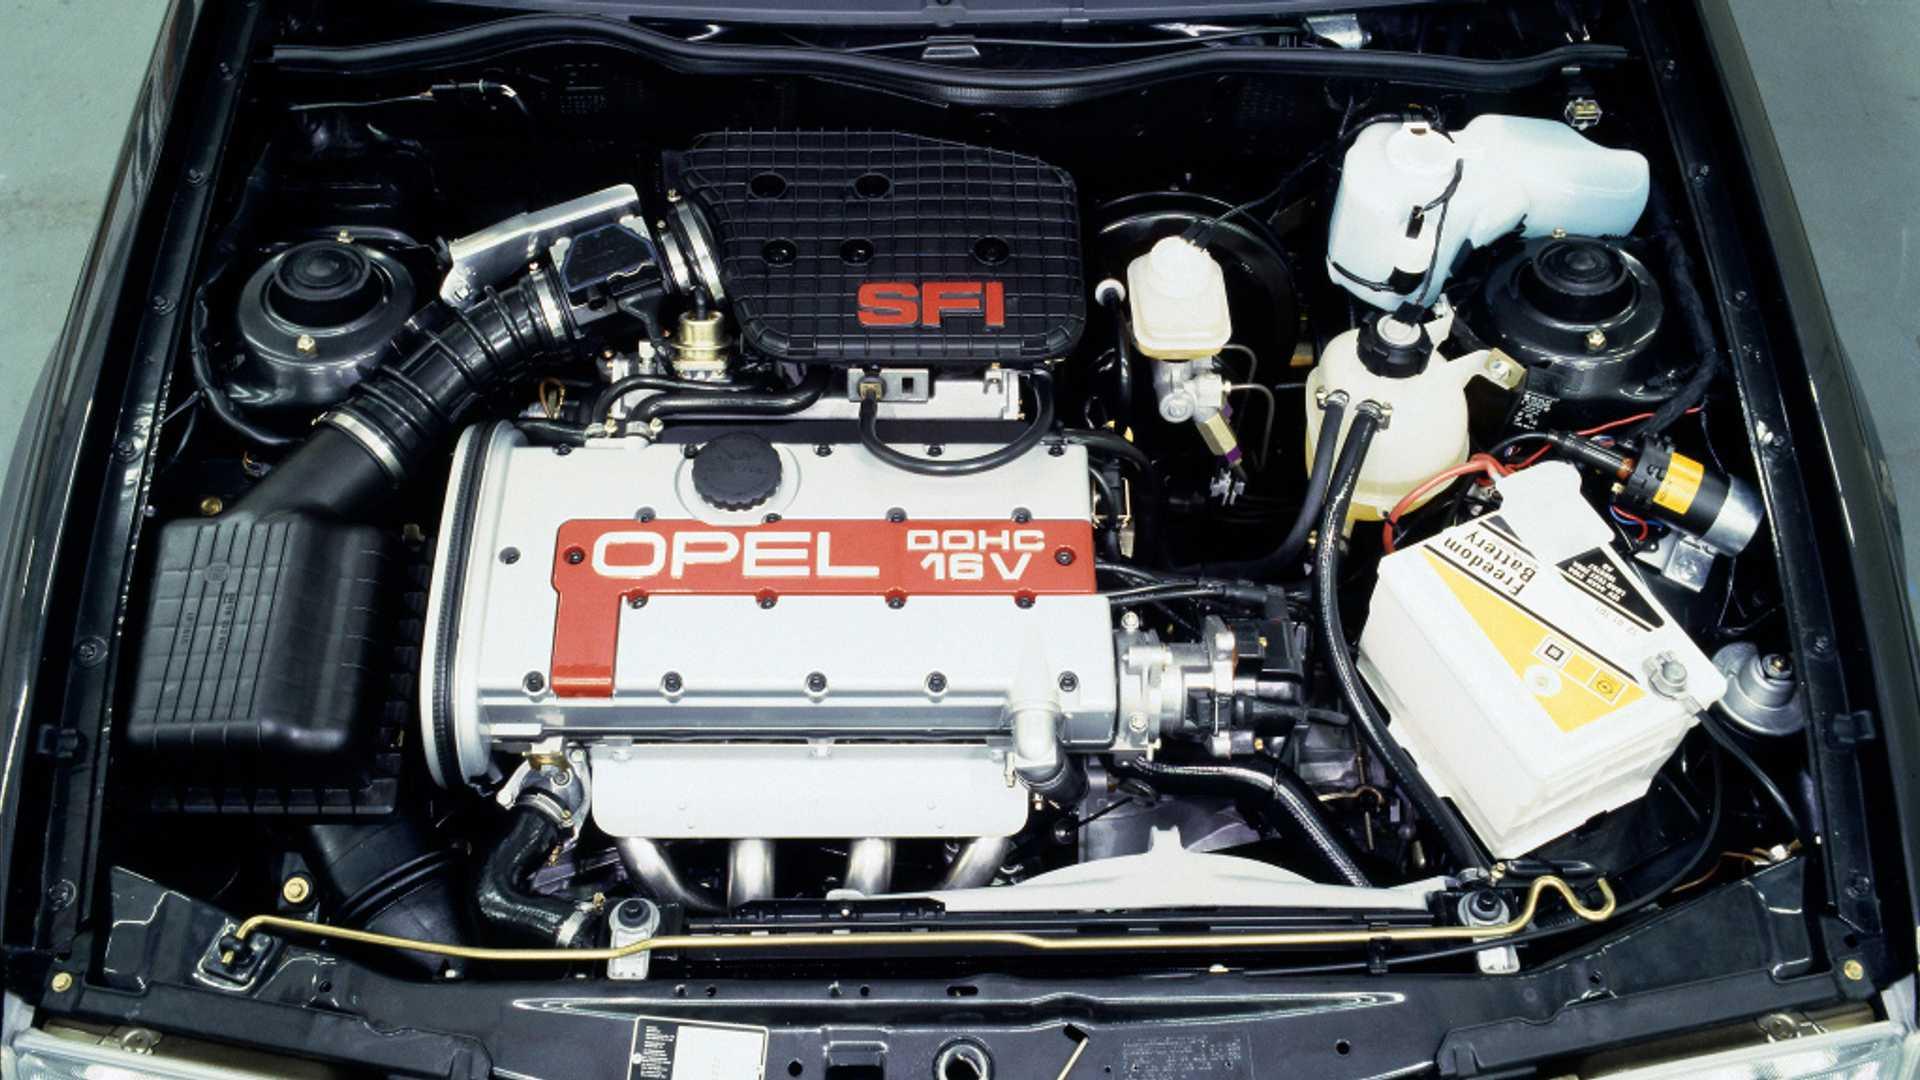 Opel Kadett GSi 16 válvulas mecánica